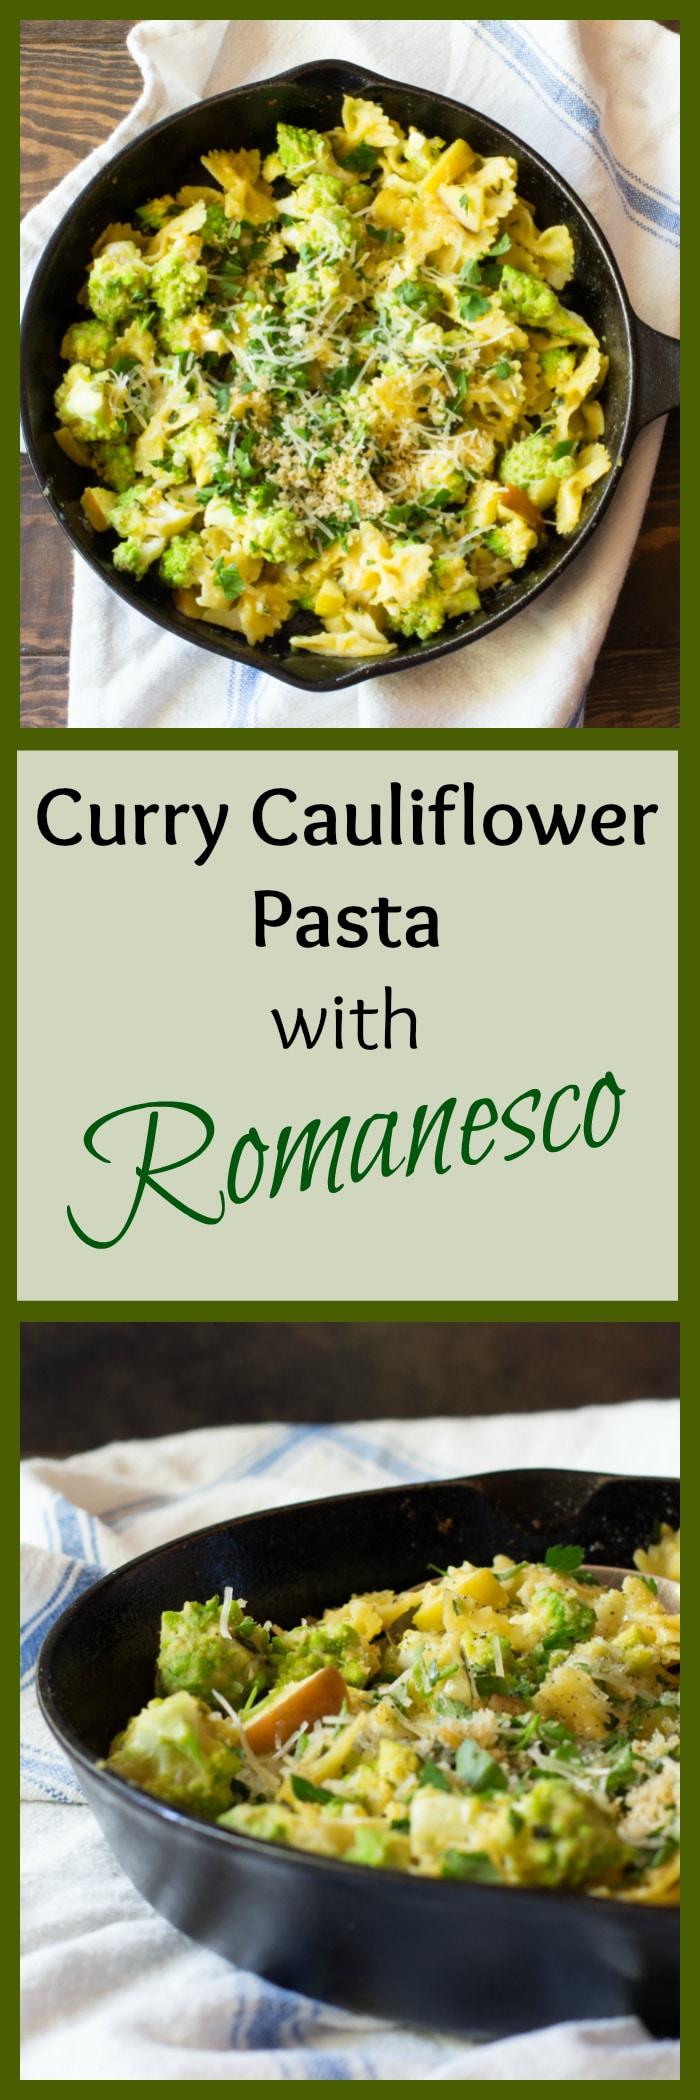 3 easy ways to make romanesco -- cauliflower & broccoli's healthy veggie cousin PLUS a vegan pasta recipe for a healthy vegetarian dinner.